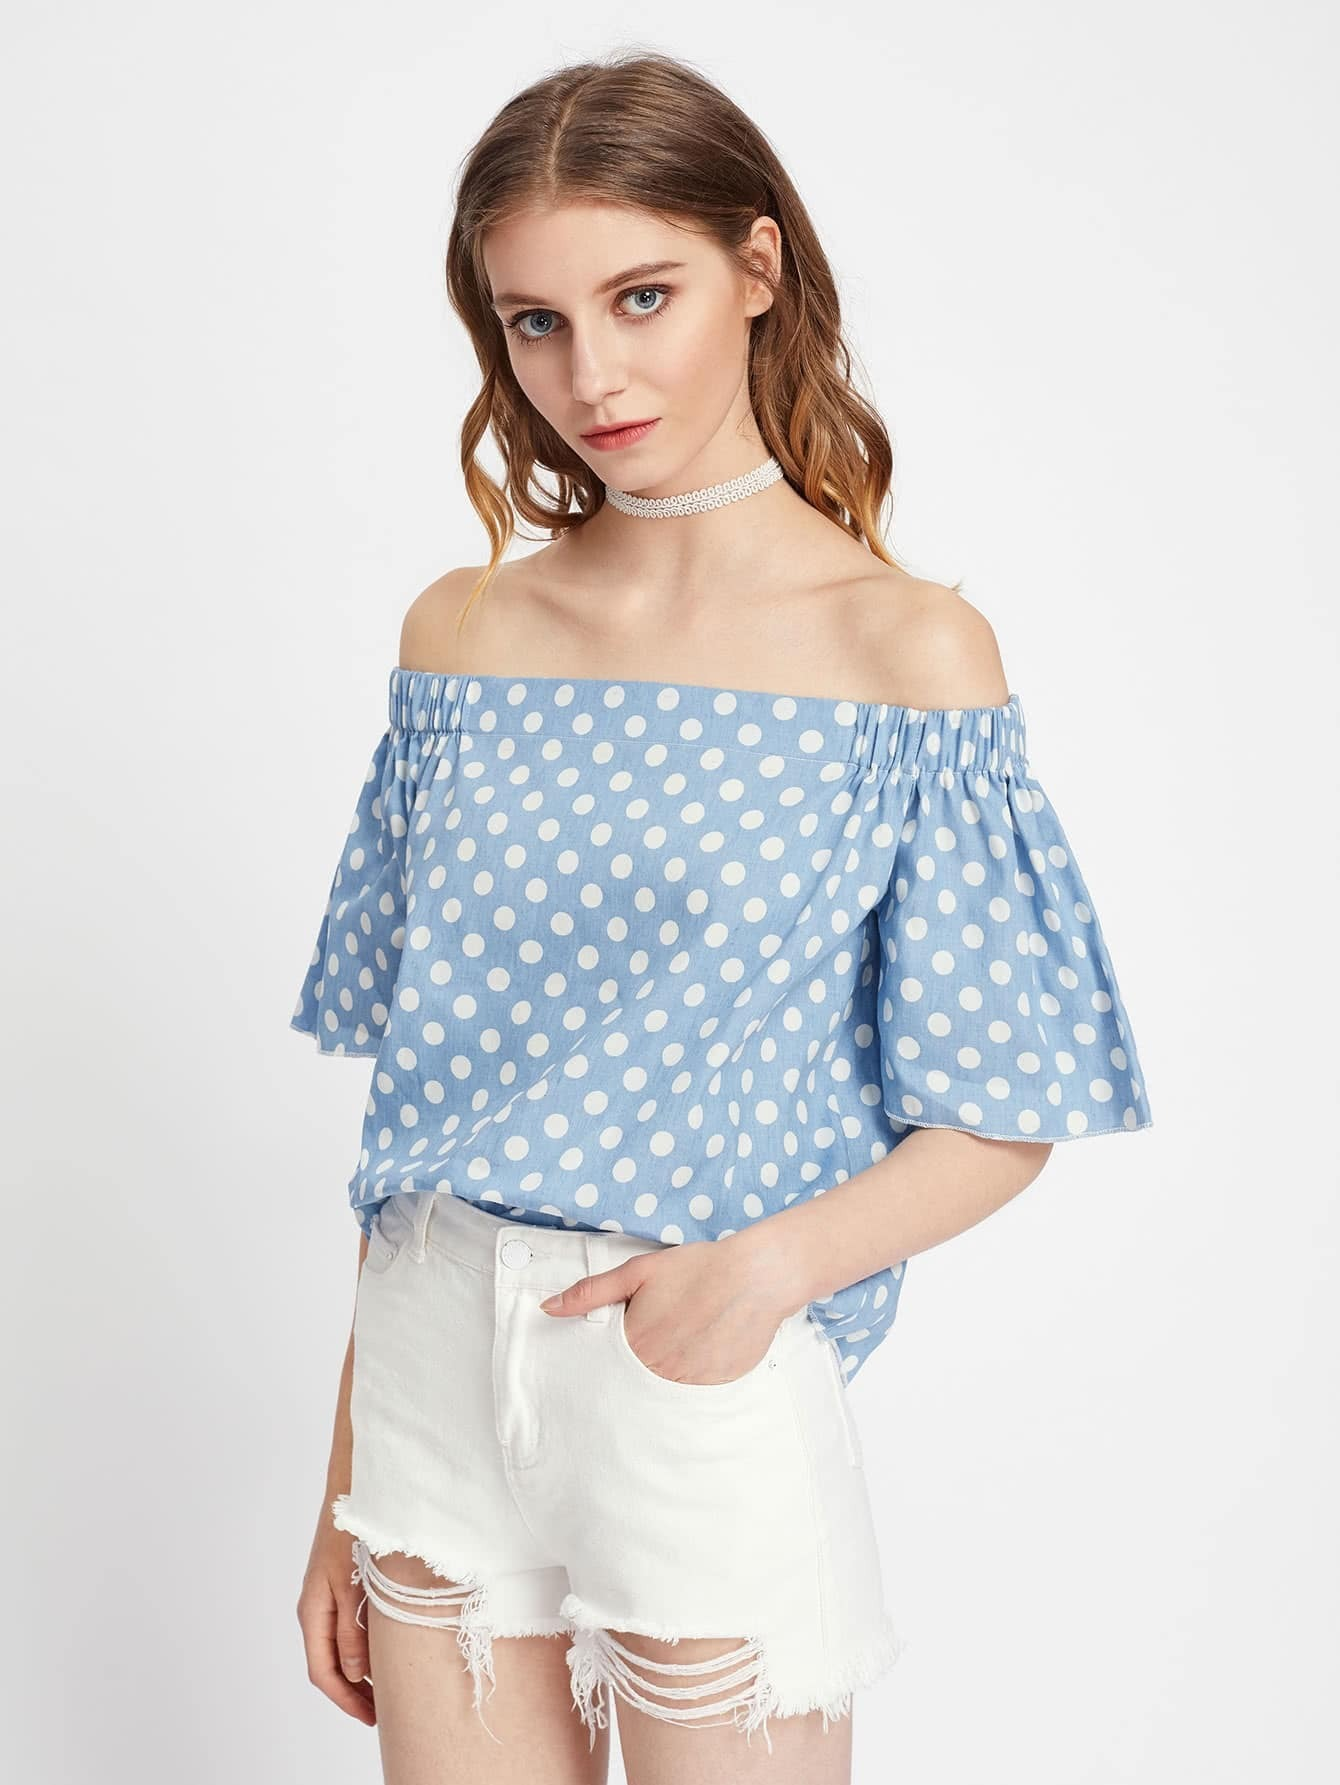 d9efa8dc646ac Off Shoulder Bell Sleeve Polka Dot Top EmmaCloth-Women Fast Fashion ...